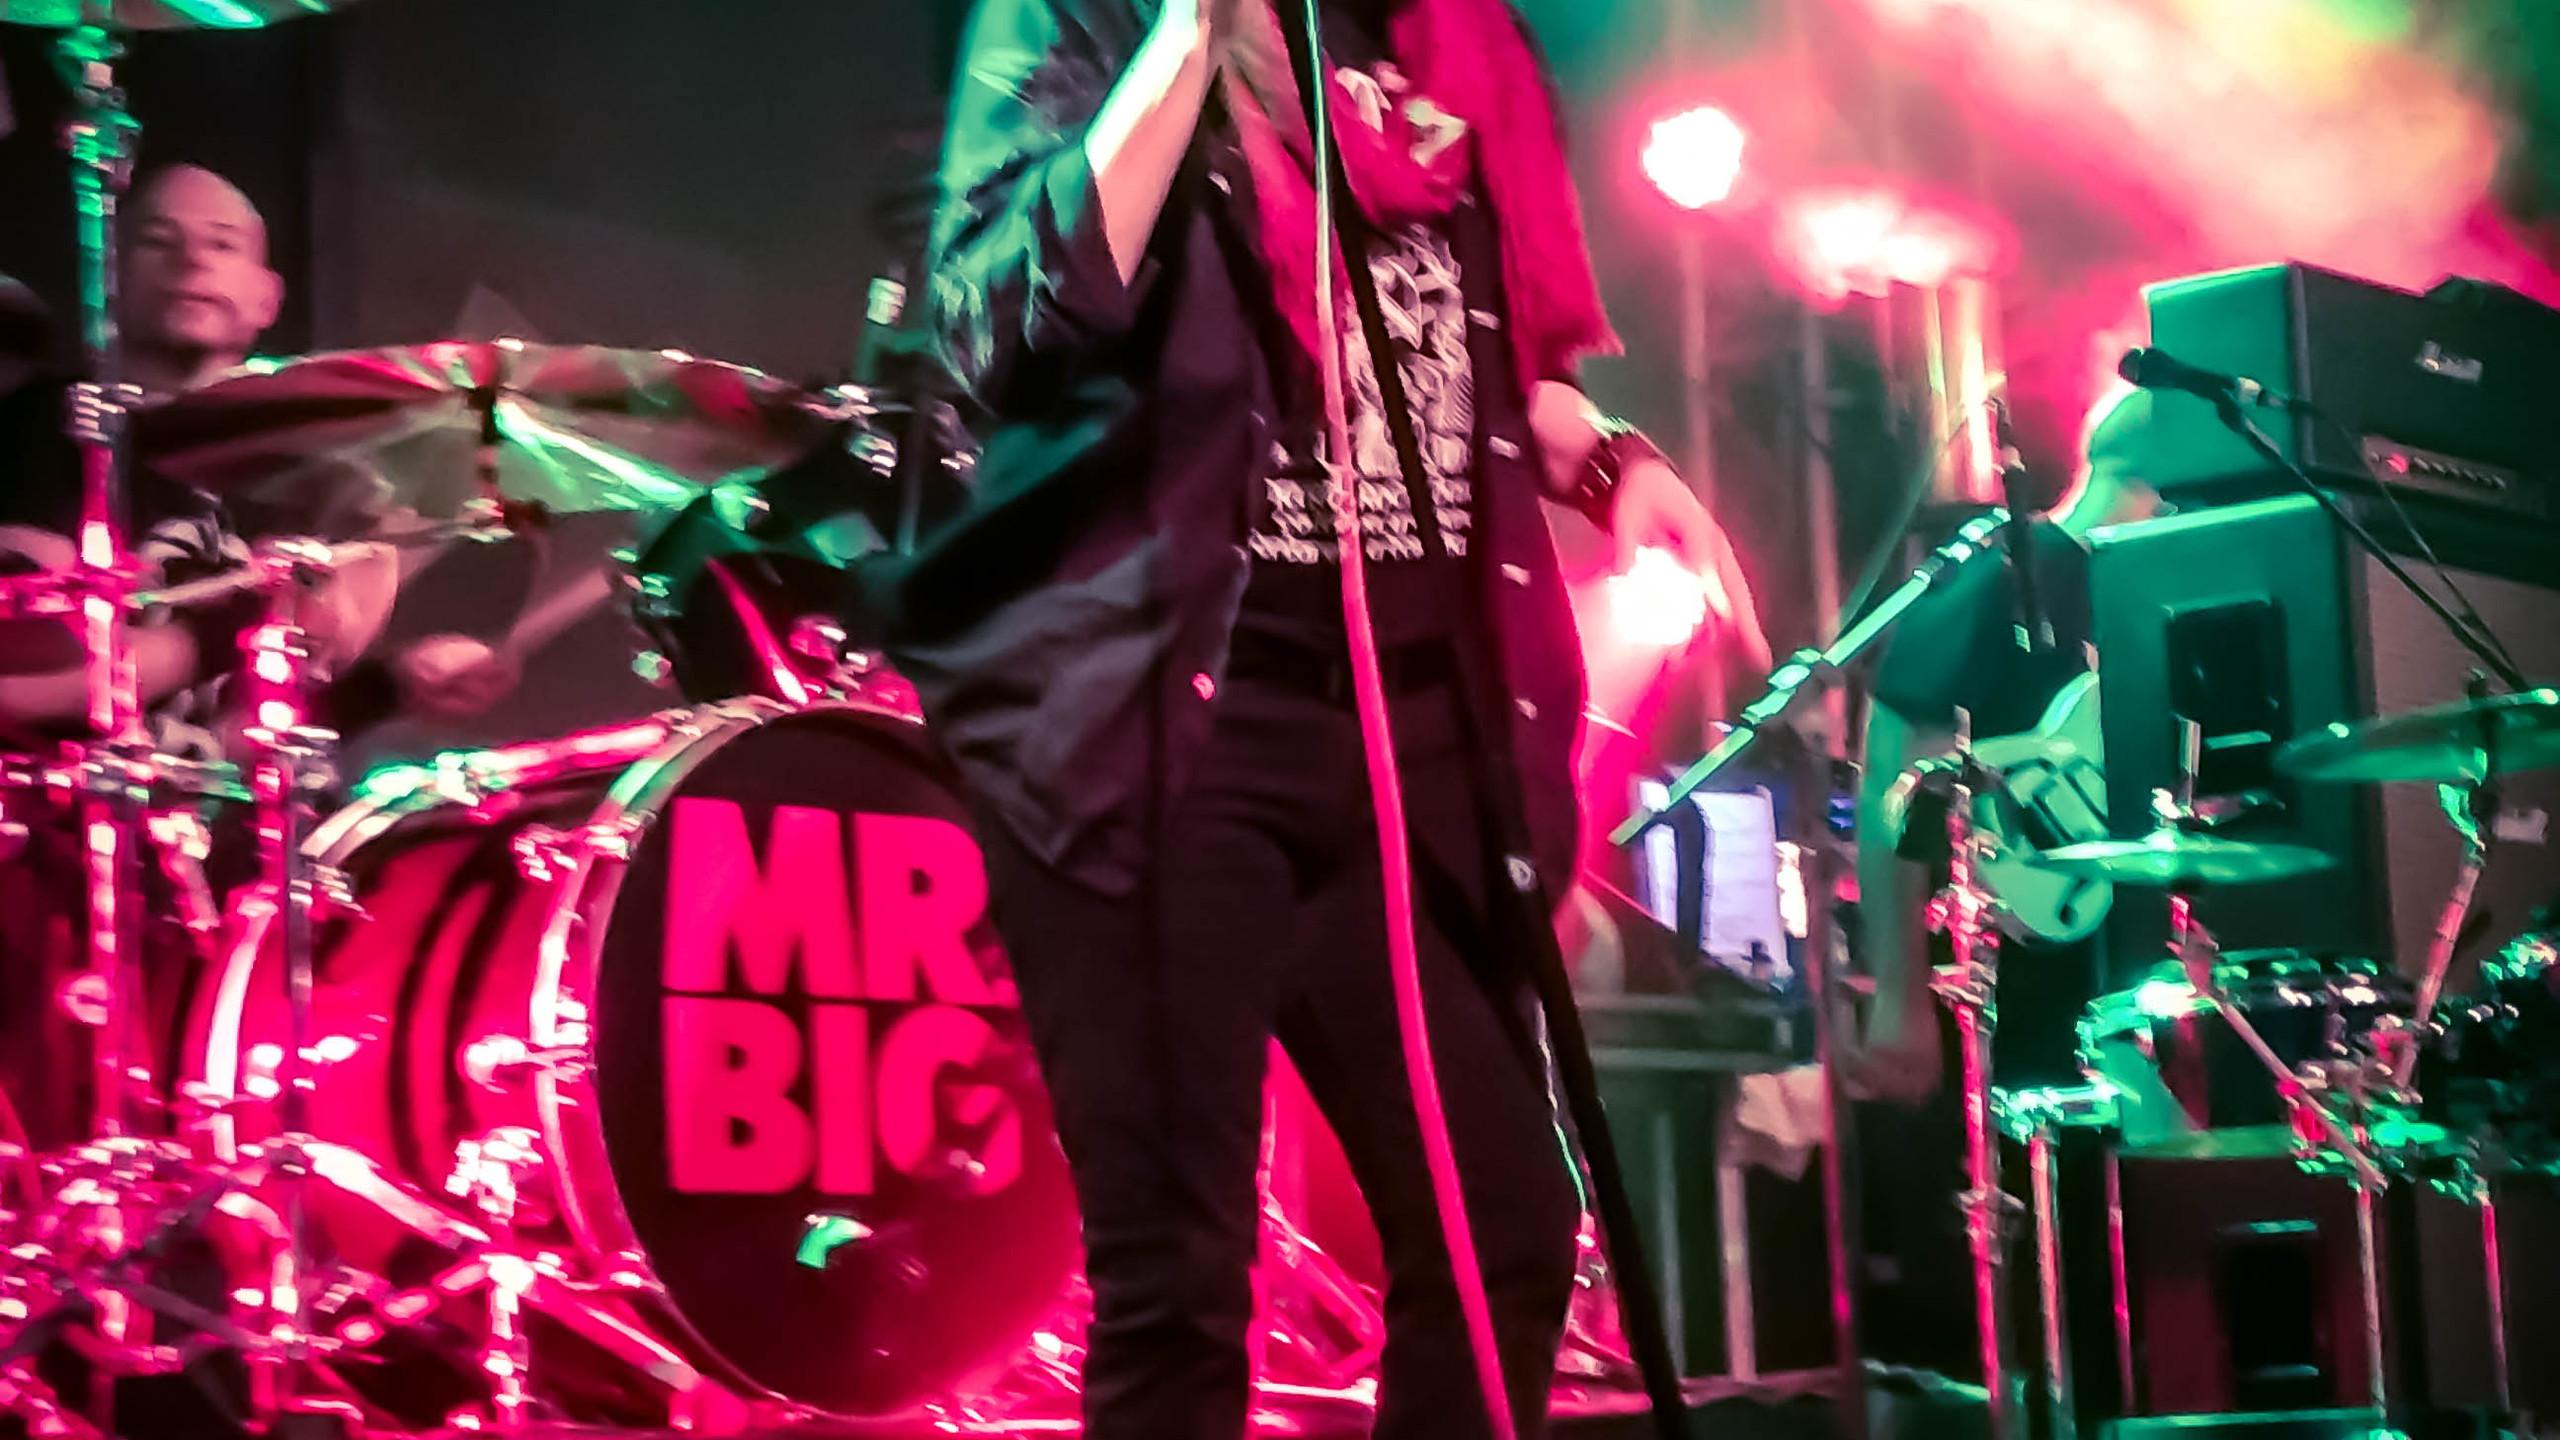 Mr. Big em POA